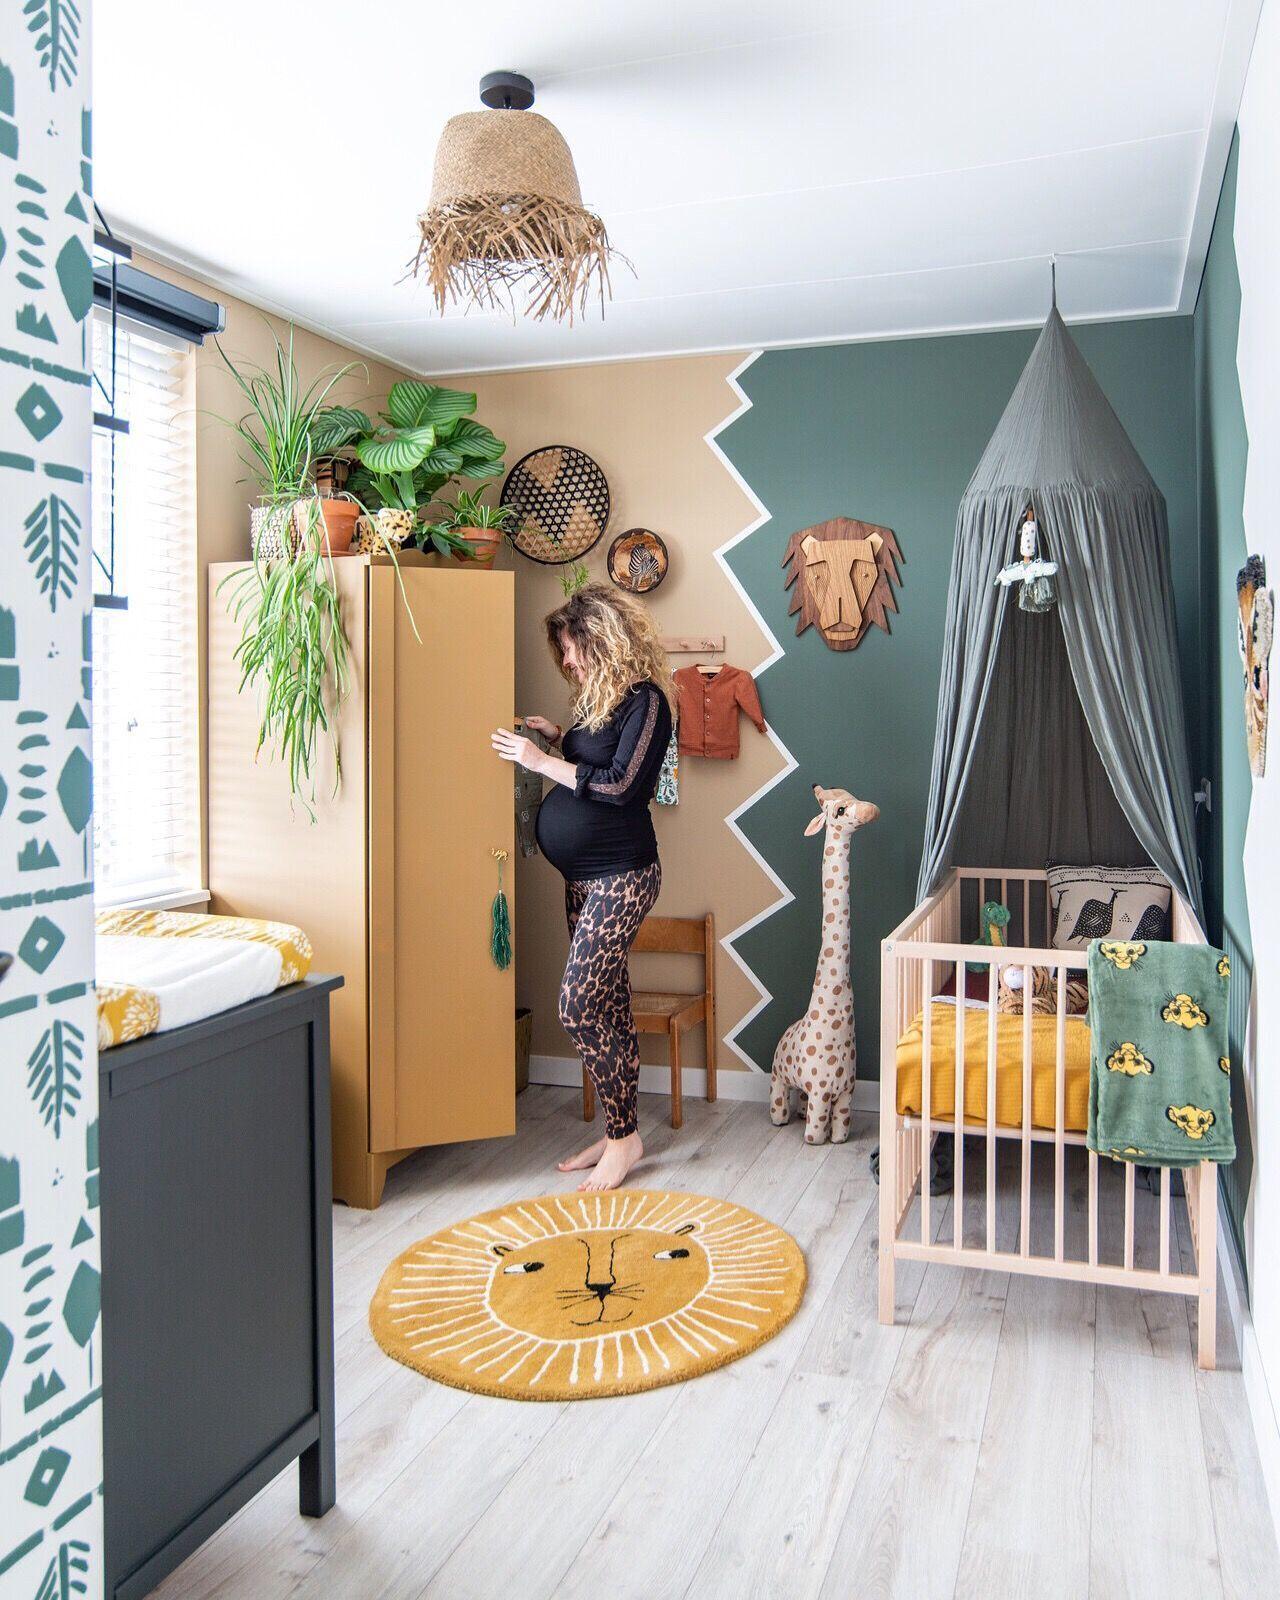 Bohemian jungle nursery Keeelly28Blog, #Bohemian #ChambreBoheme